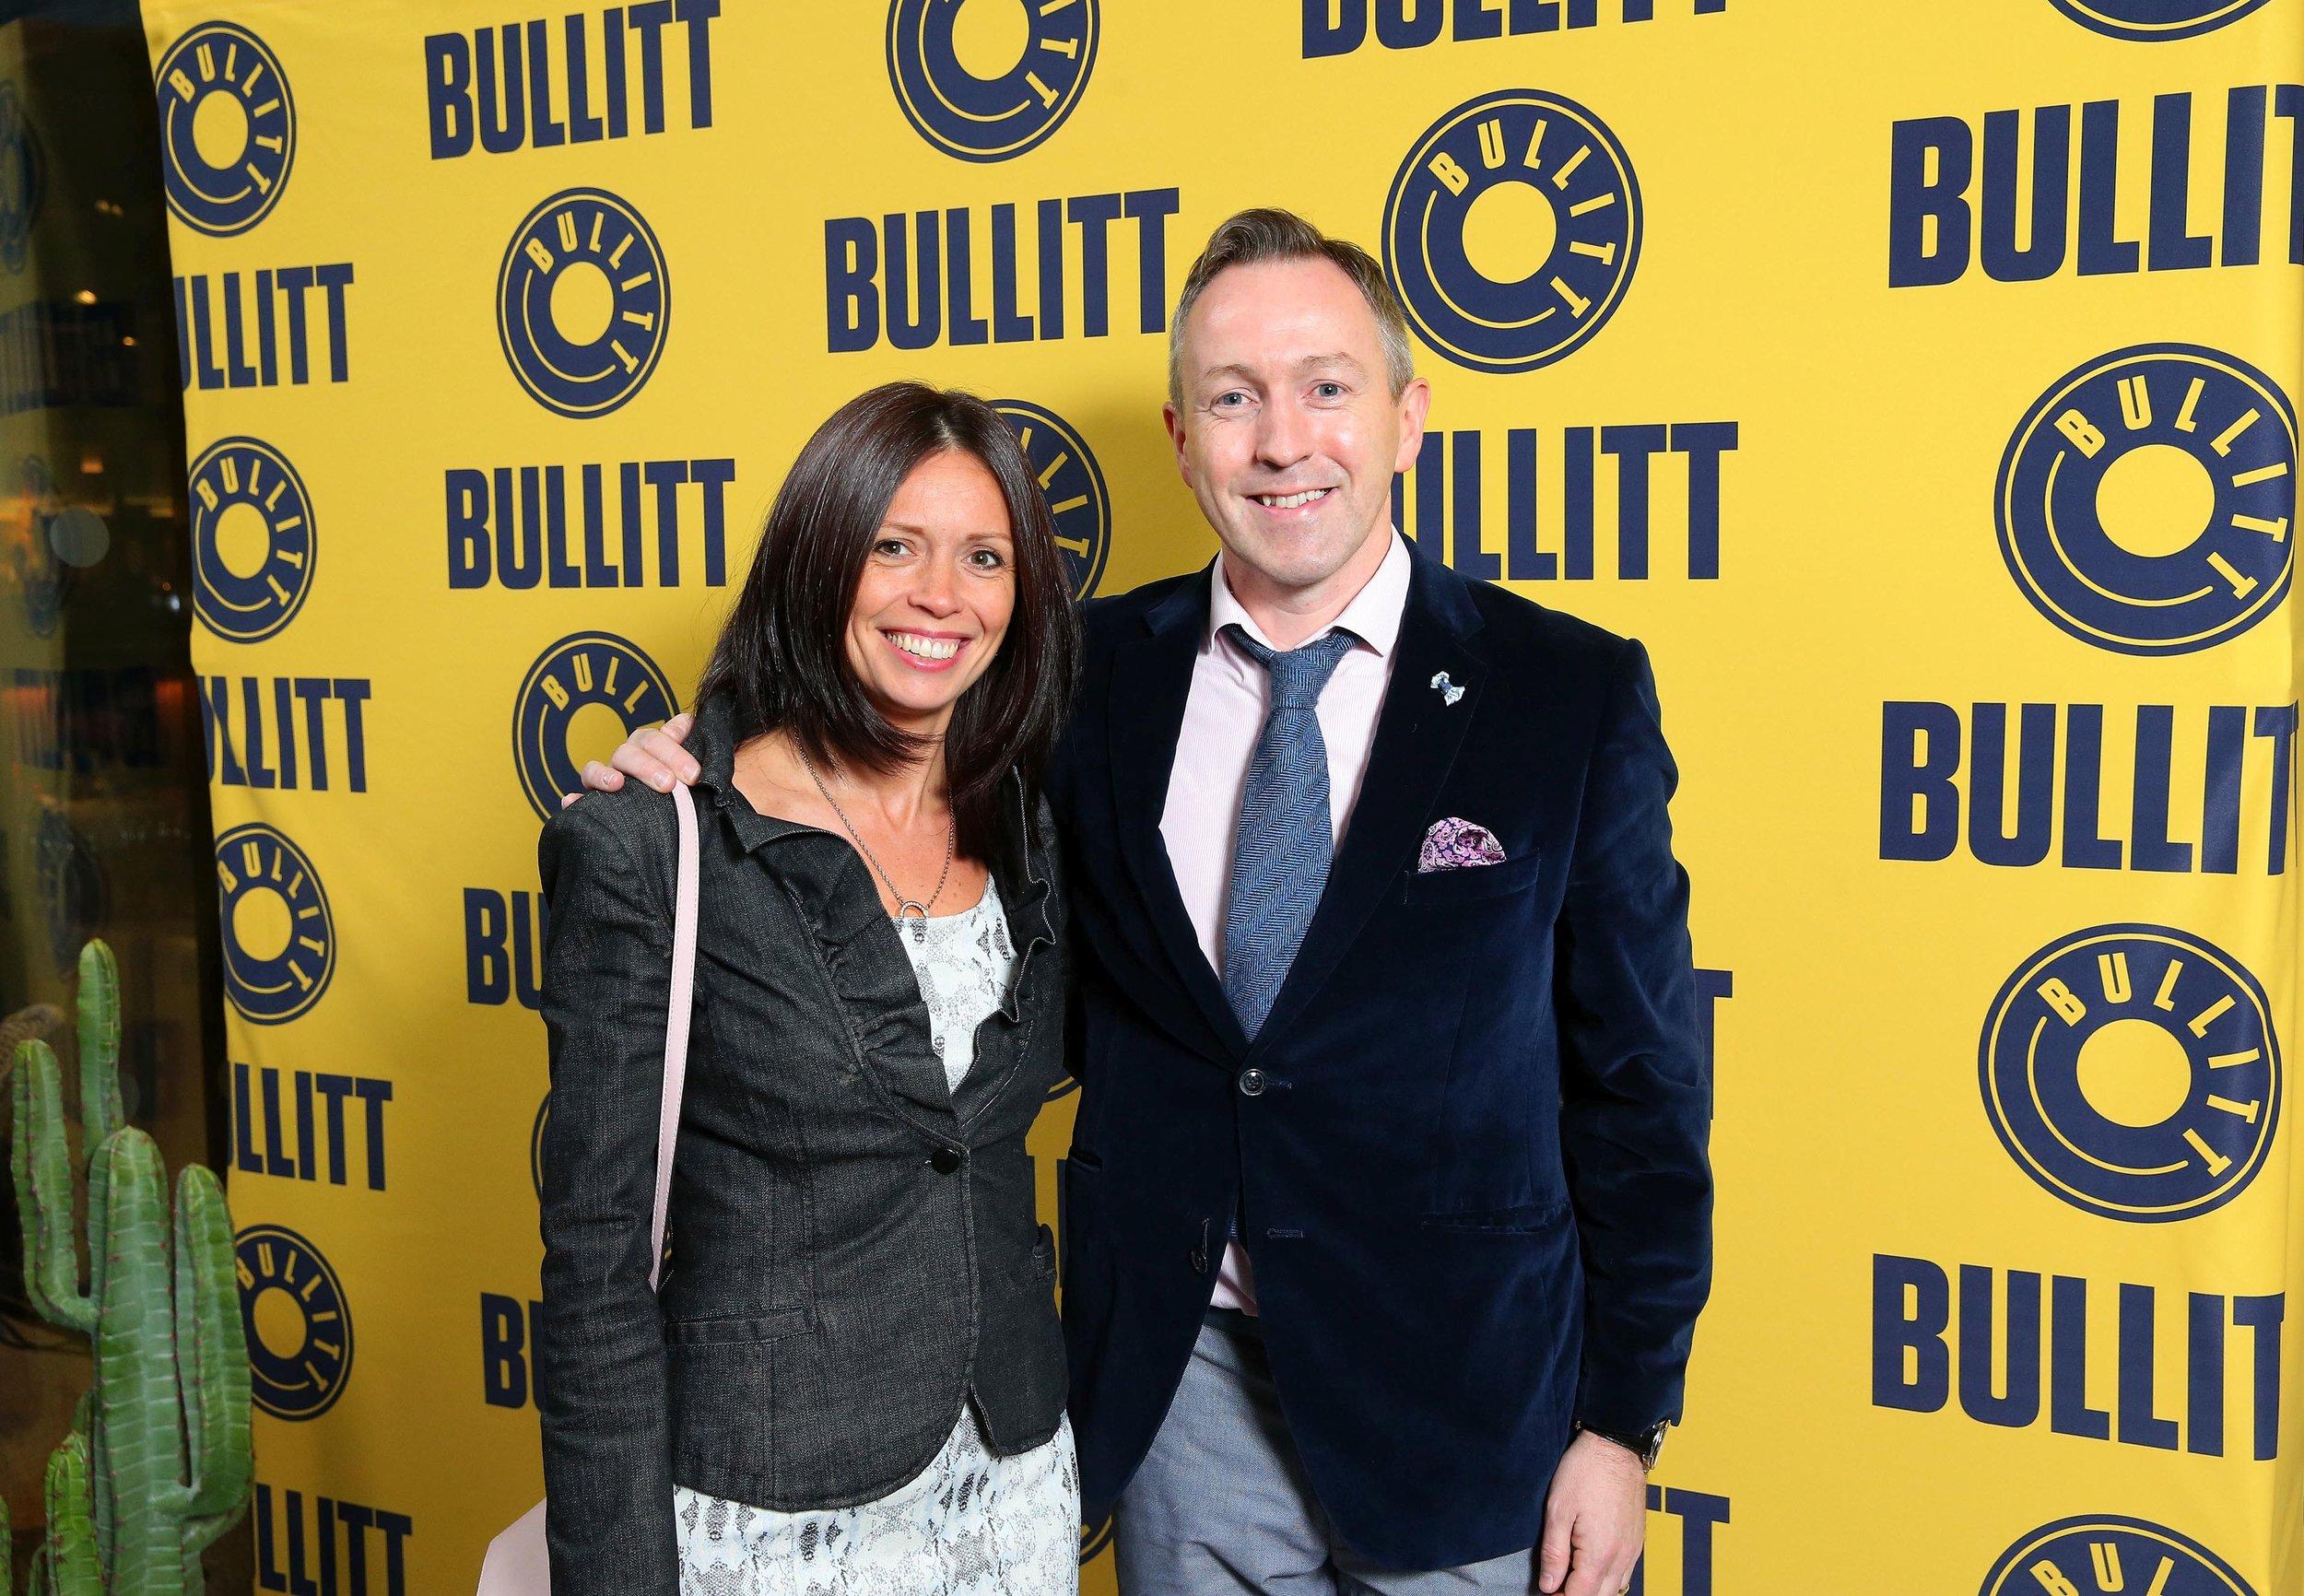 Bullitt Launch Socials 11.JPG